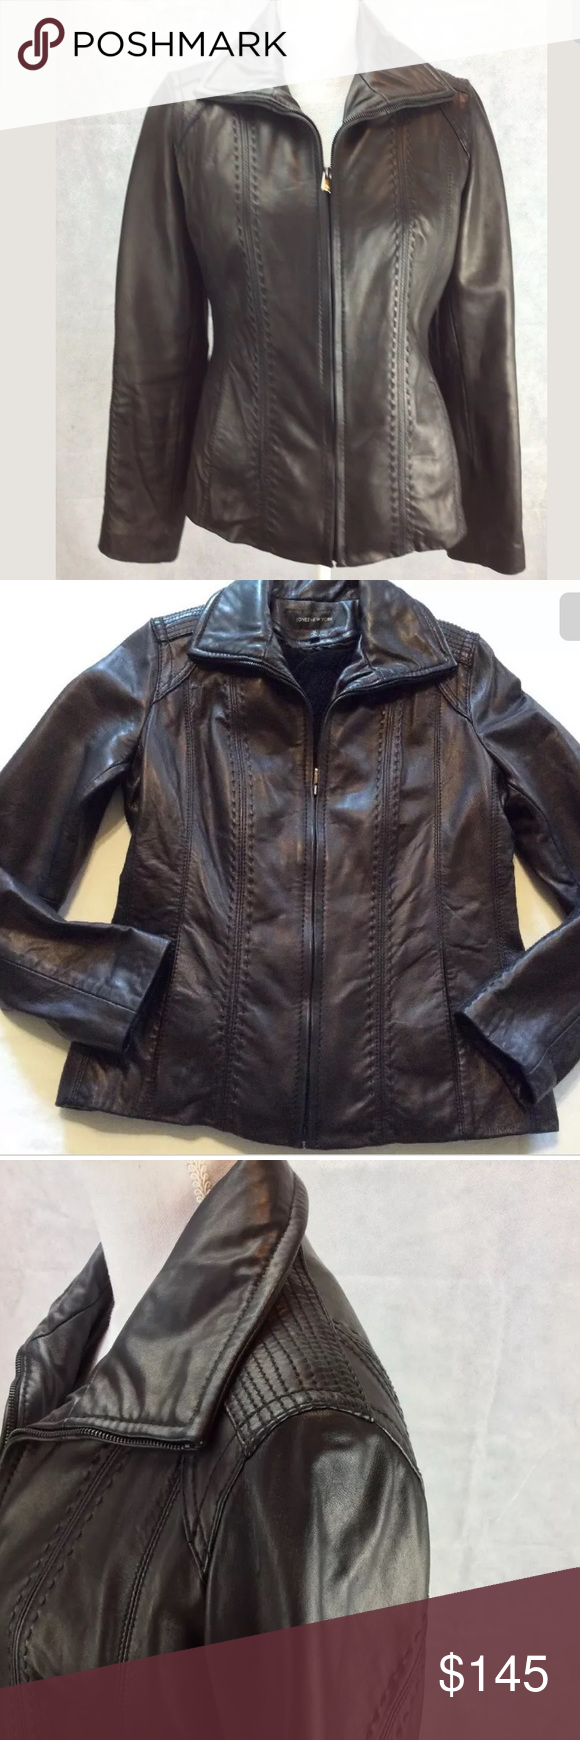 Jones New York Women S Leather Motorcycle Jacket Jones New York Women S Leather Jacket Size M Leather Motorcycle Jacket Women Leather Motorcycle Jacket Jackets [ 1740 x 580 Pixel ]